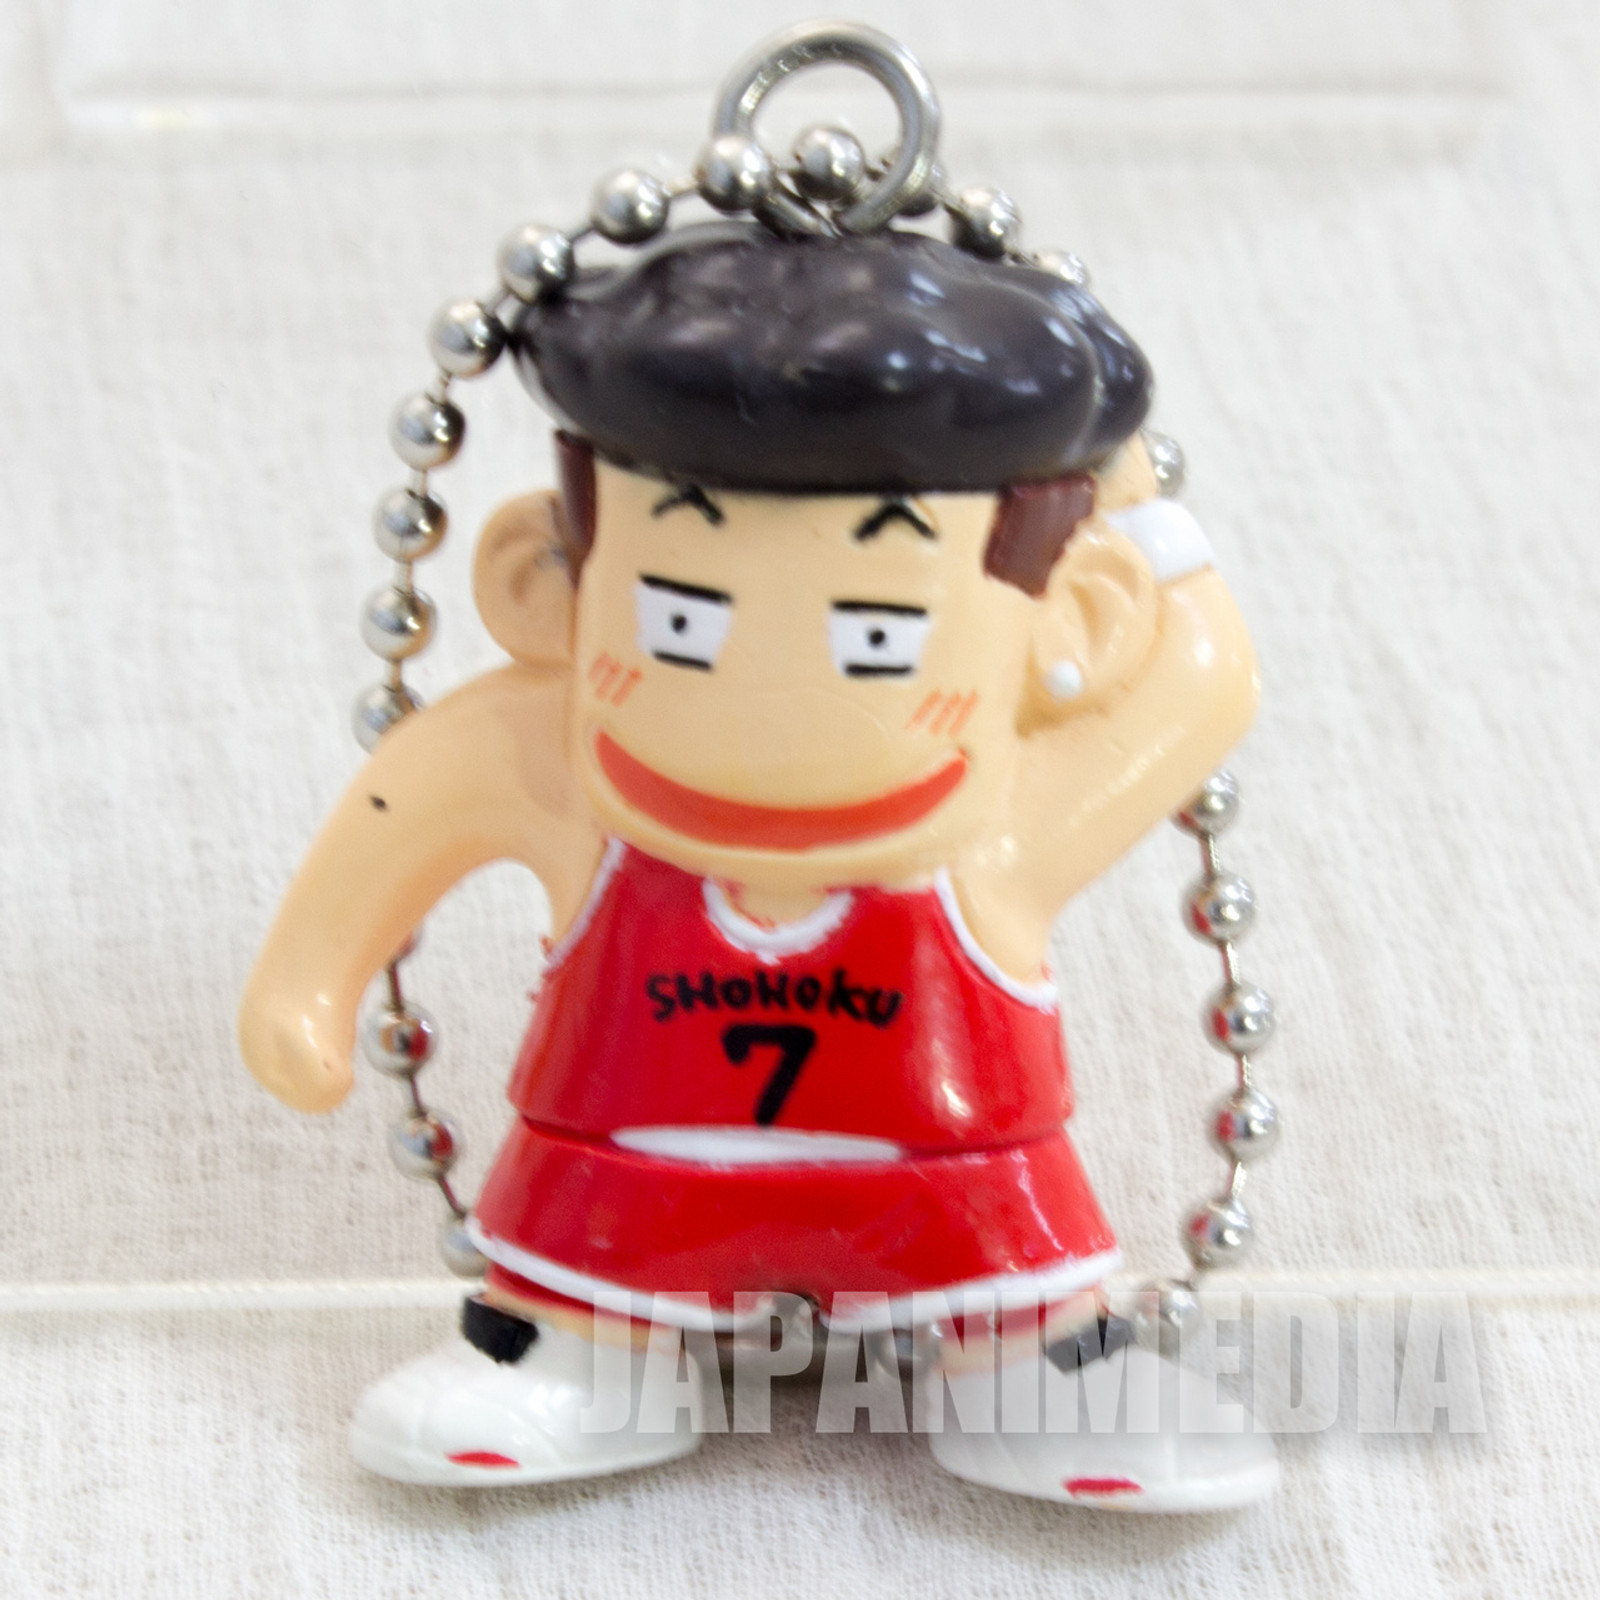 SLAM DUNK Ryota Miyagi Mini Figure Ball Key Chain JAPAN ANIME MANGA 1